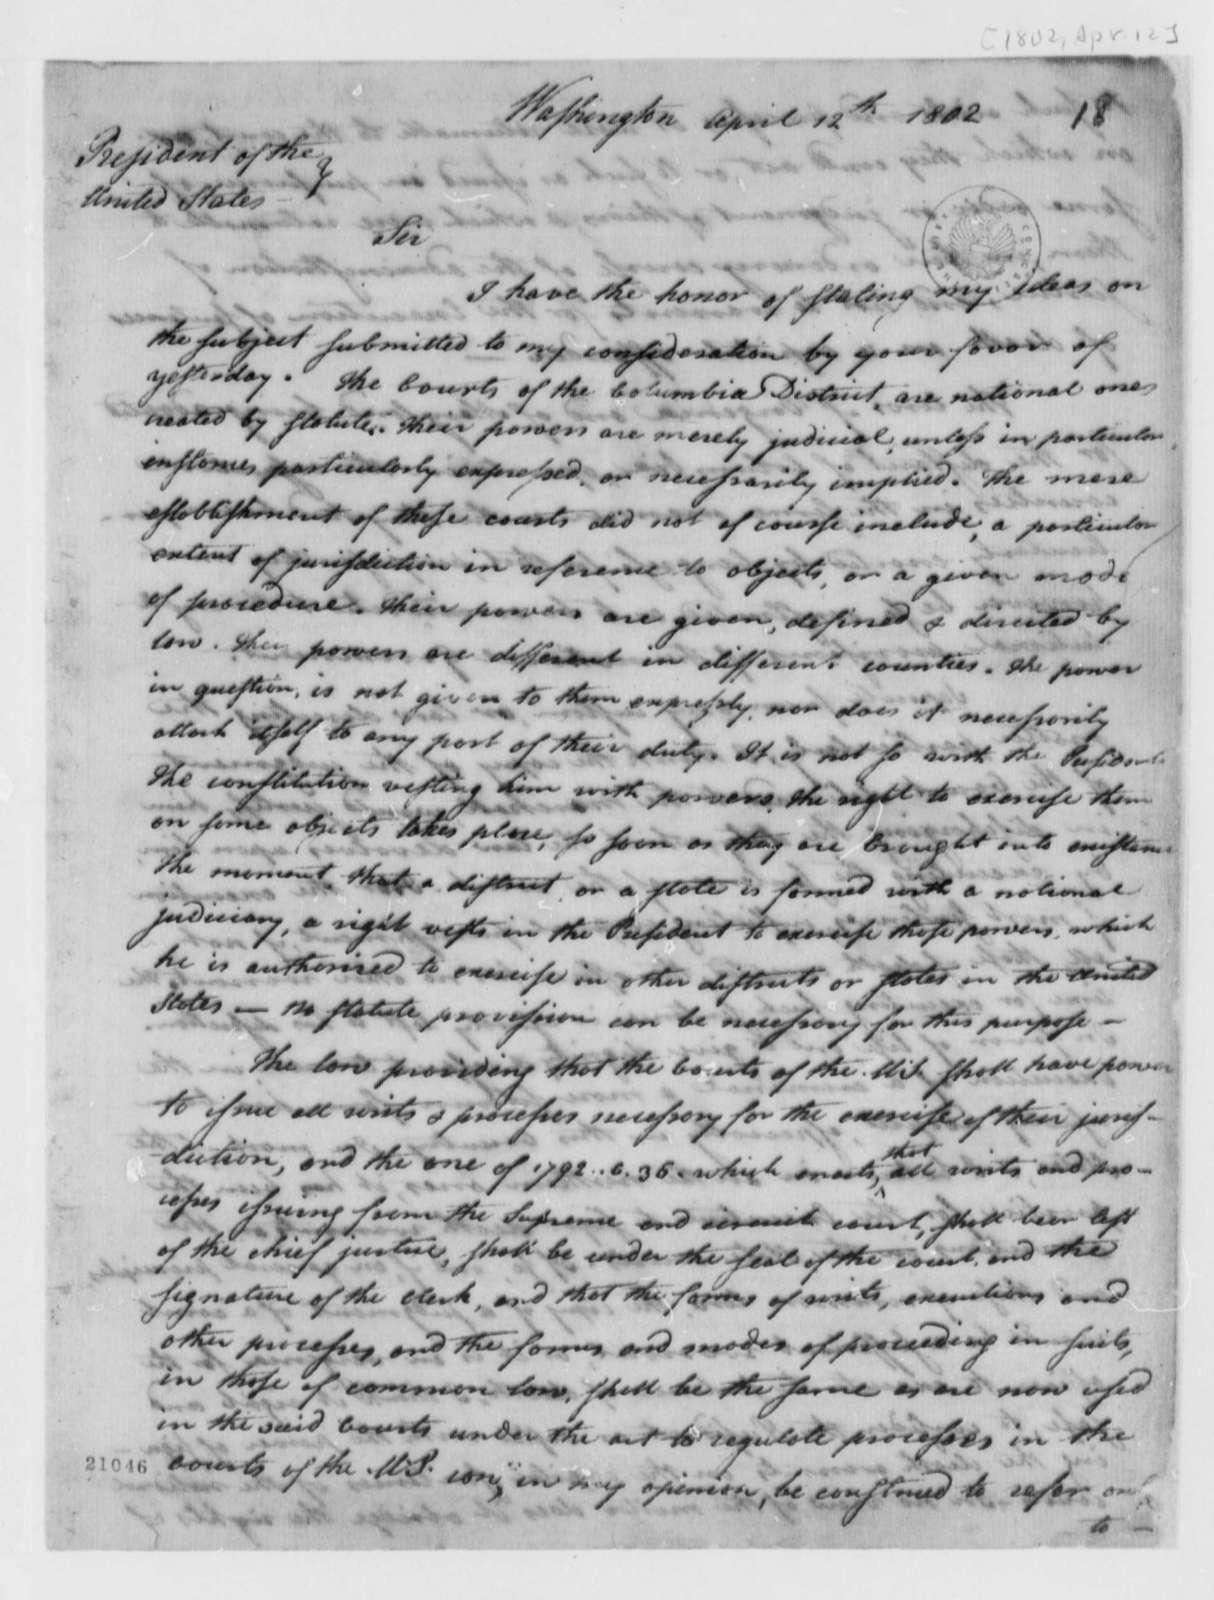 Levi Lincoln to Thomas Jefferson, April 12, 1802